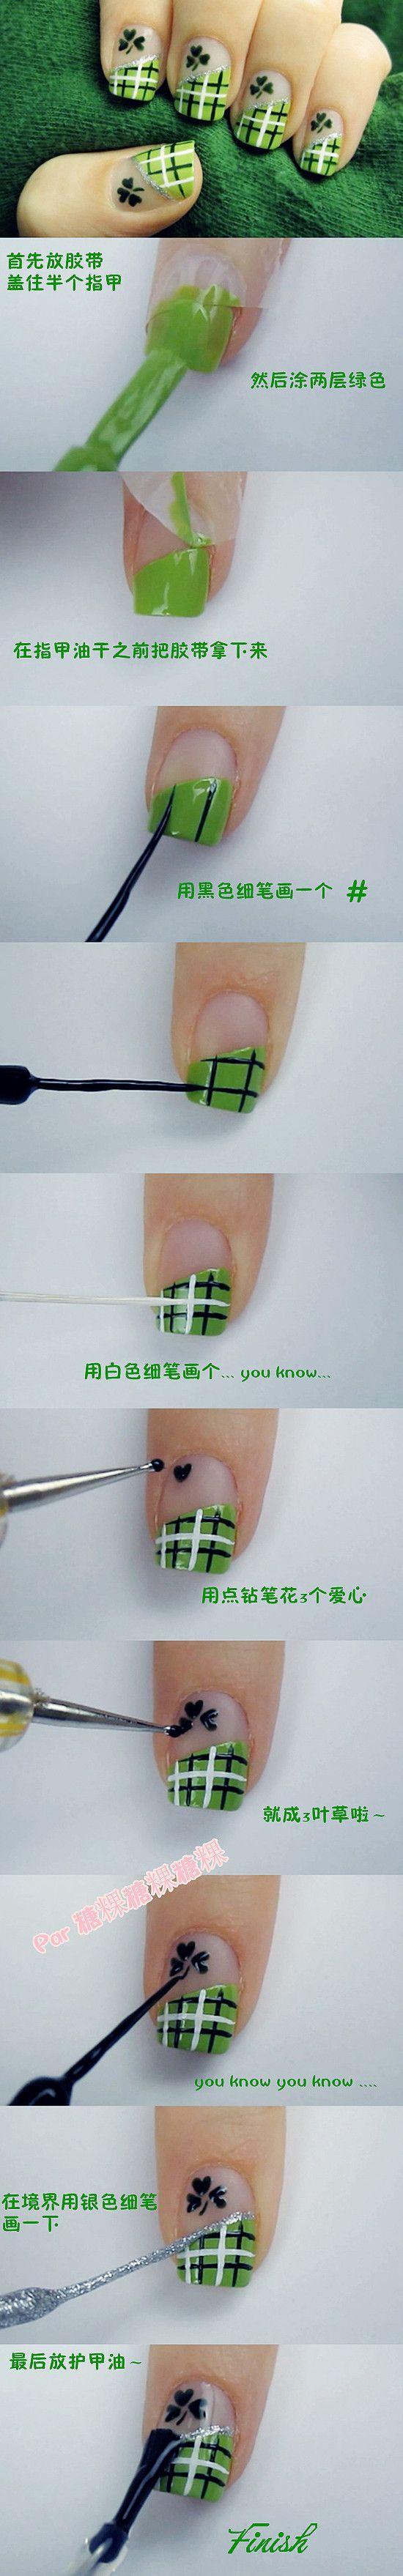 fingernägel selber machen 5 besten - Page 3 of 5 - nagel-design ...